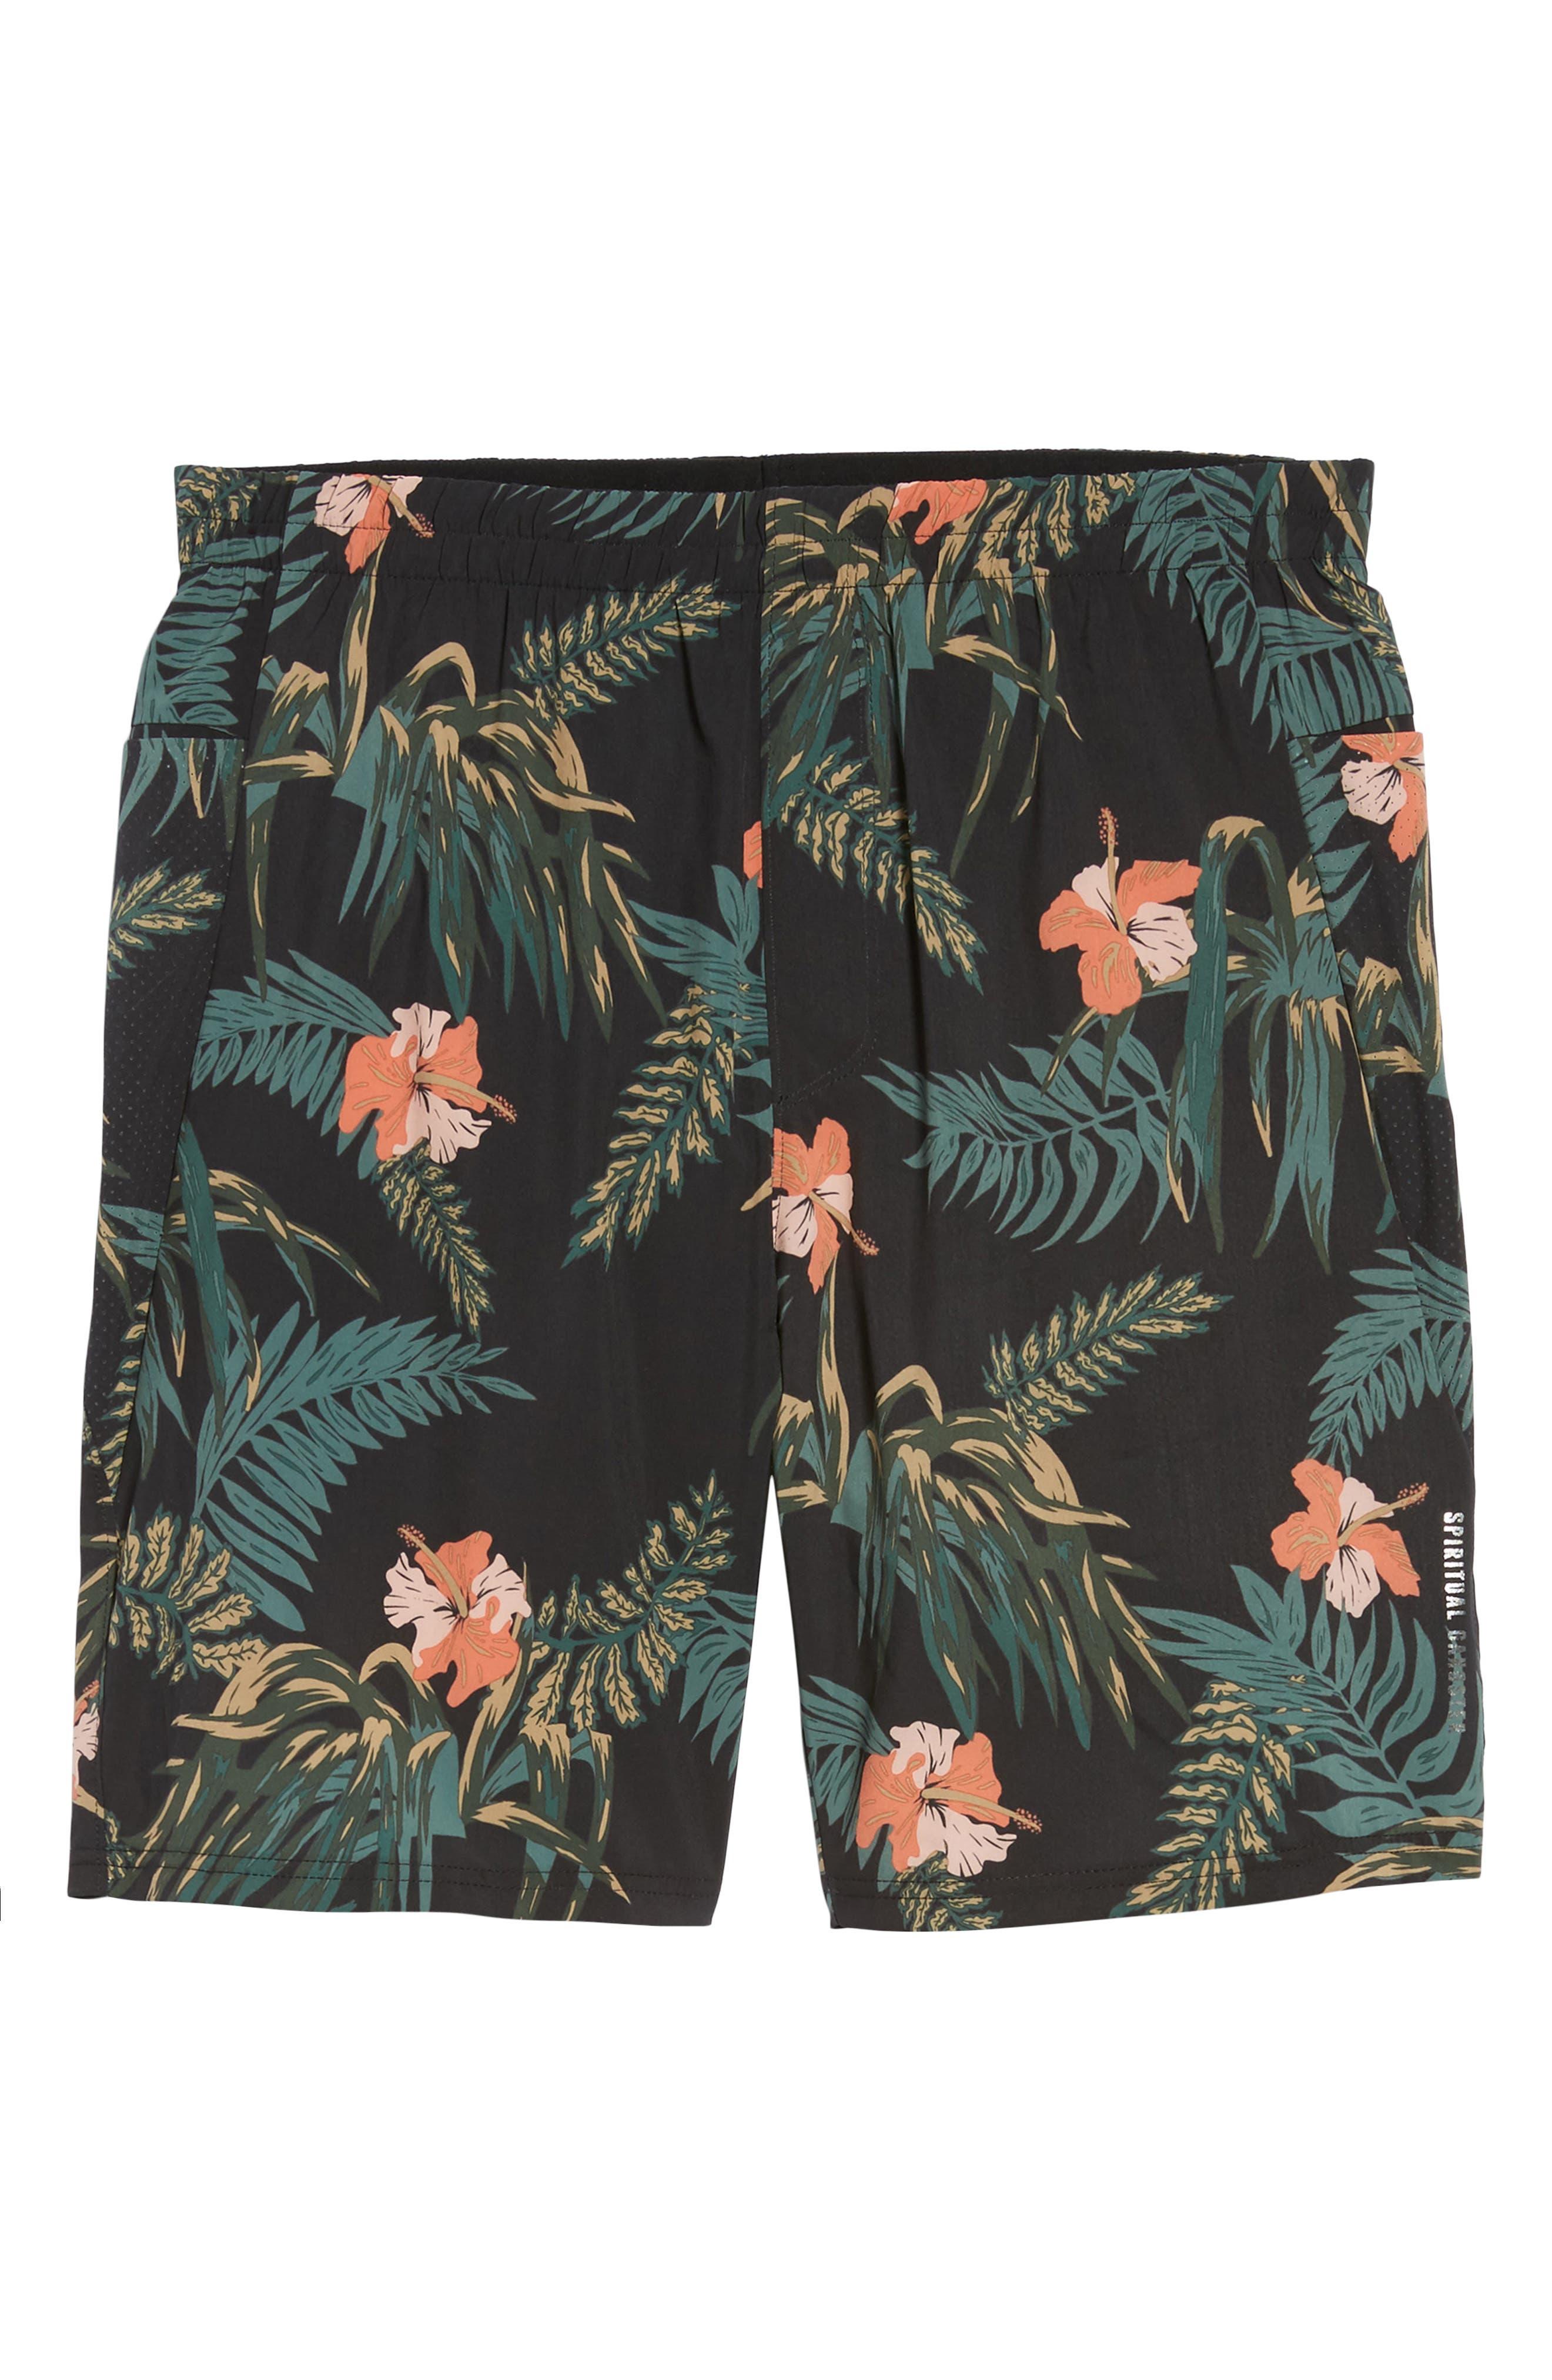 Ignite Shorts,                             Alternate thumbnail 6, color,                             Floral/ Multi